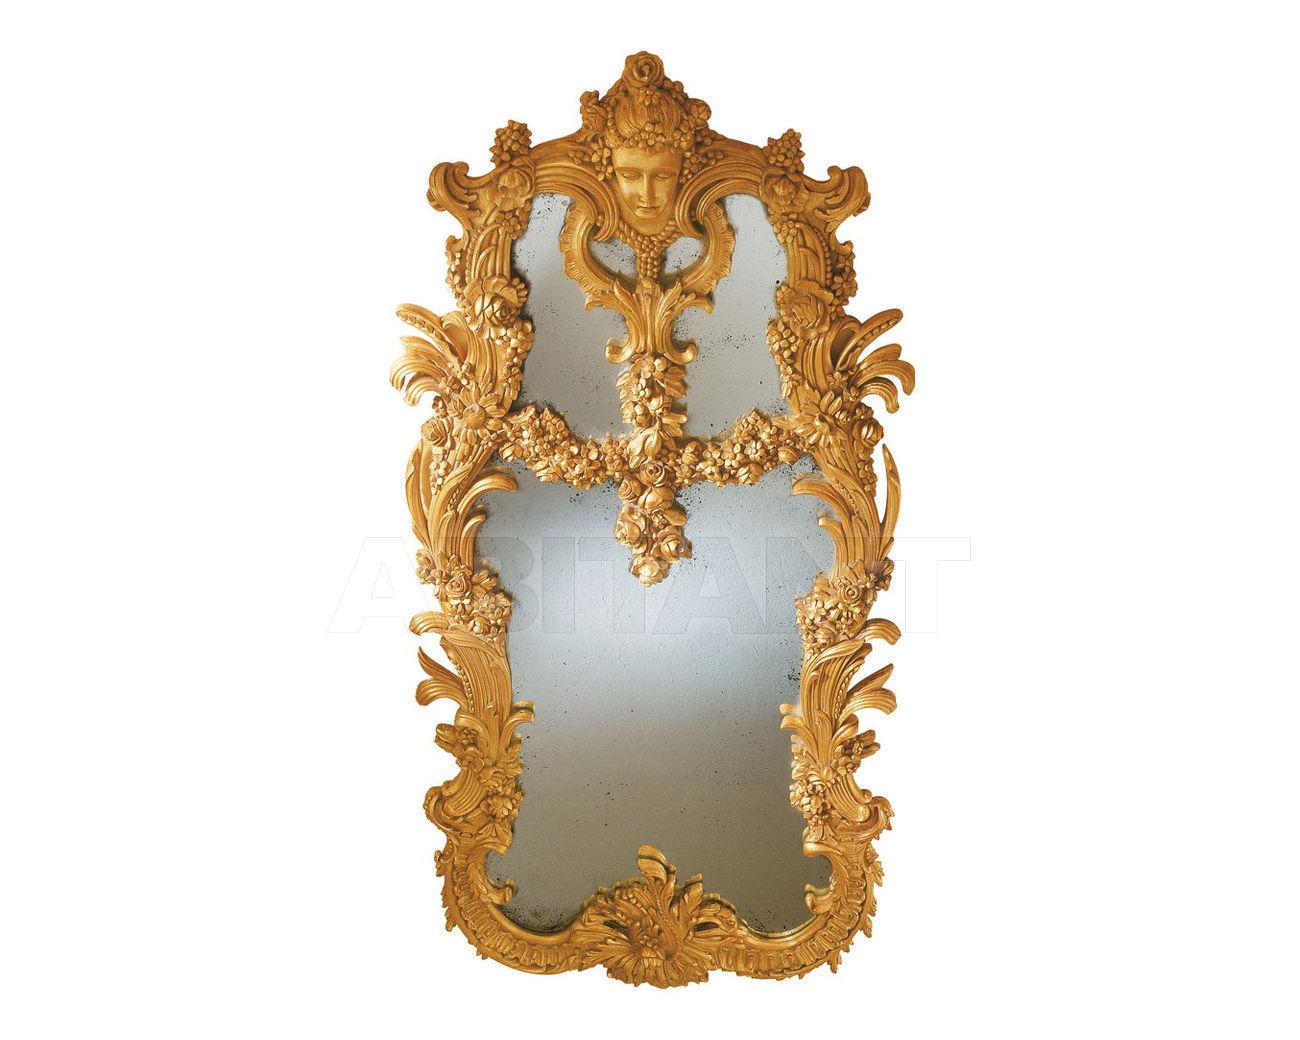 Купить Зеркало настенное Colombostile s.p.a. 2010 2312 SP